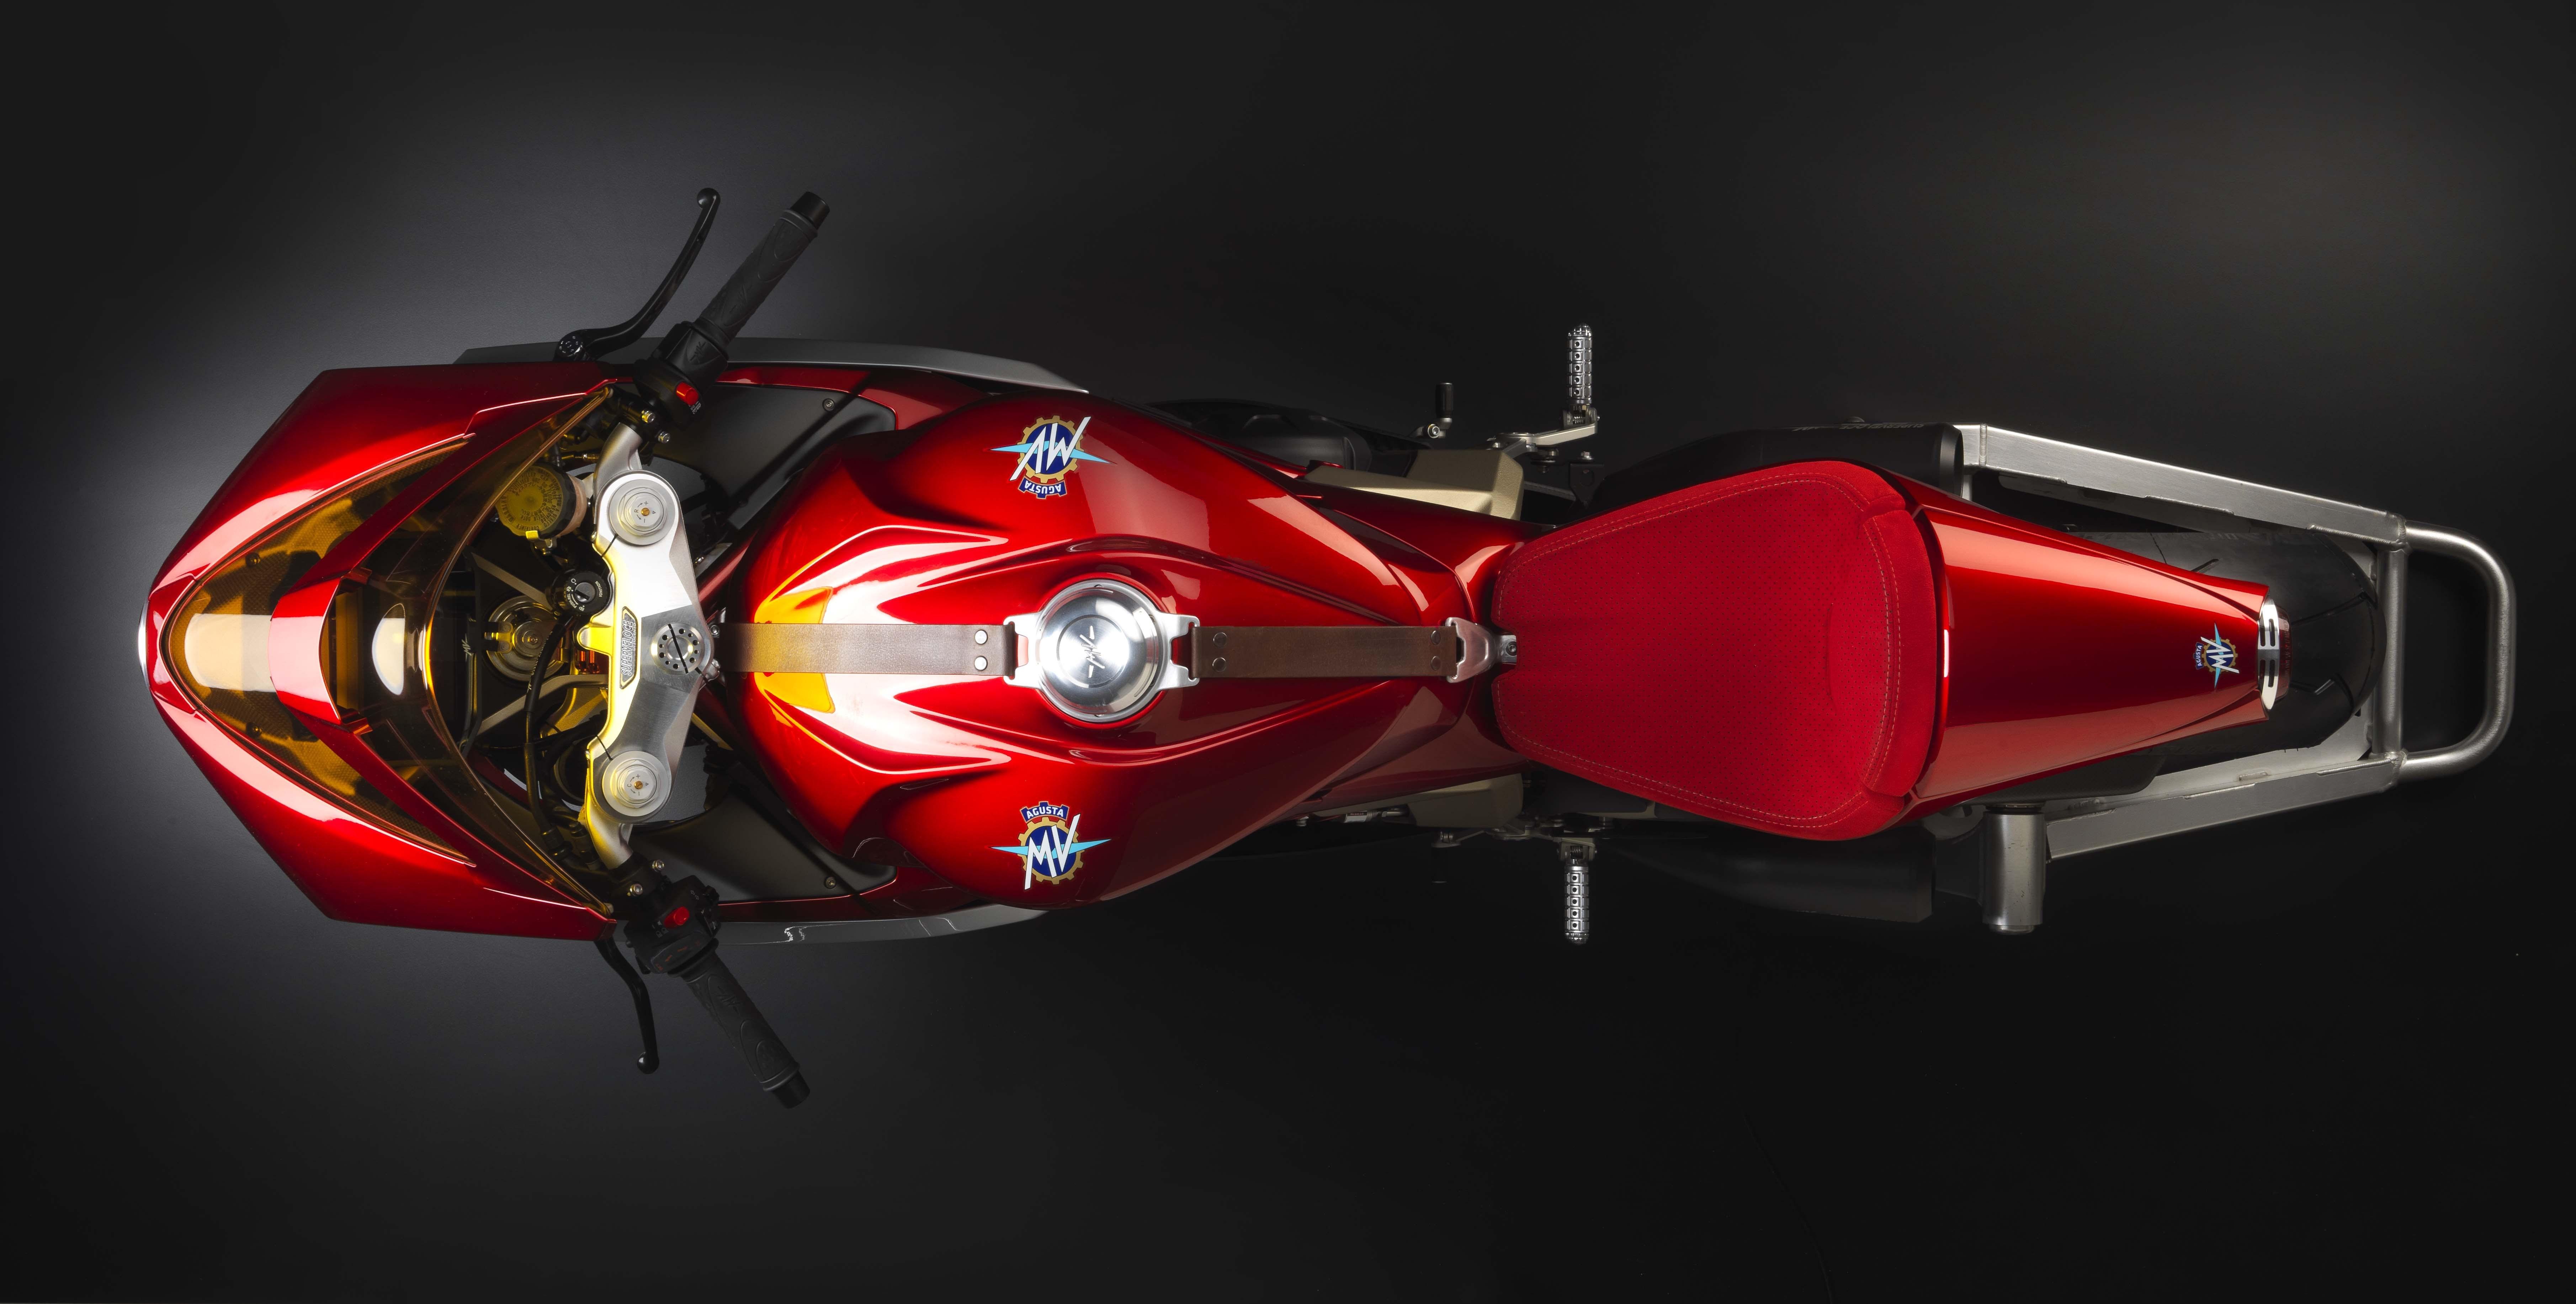 MV-Agusta-Superveloce-800-concept-06